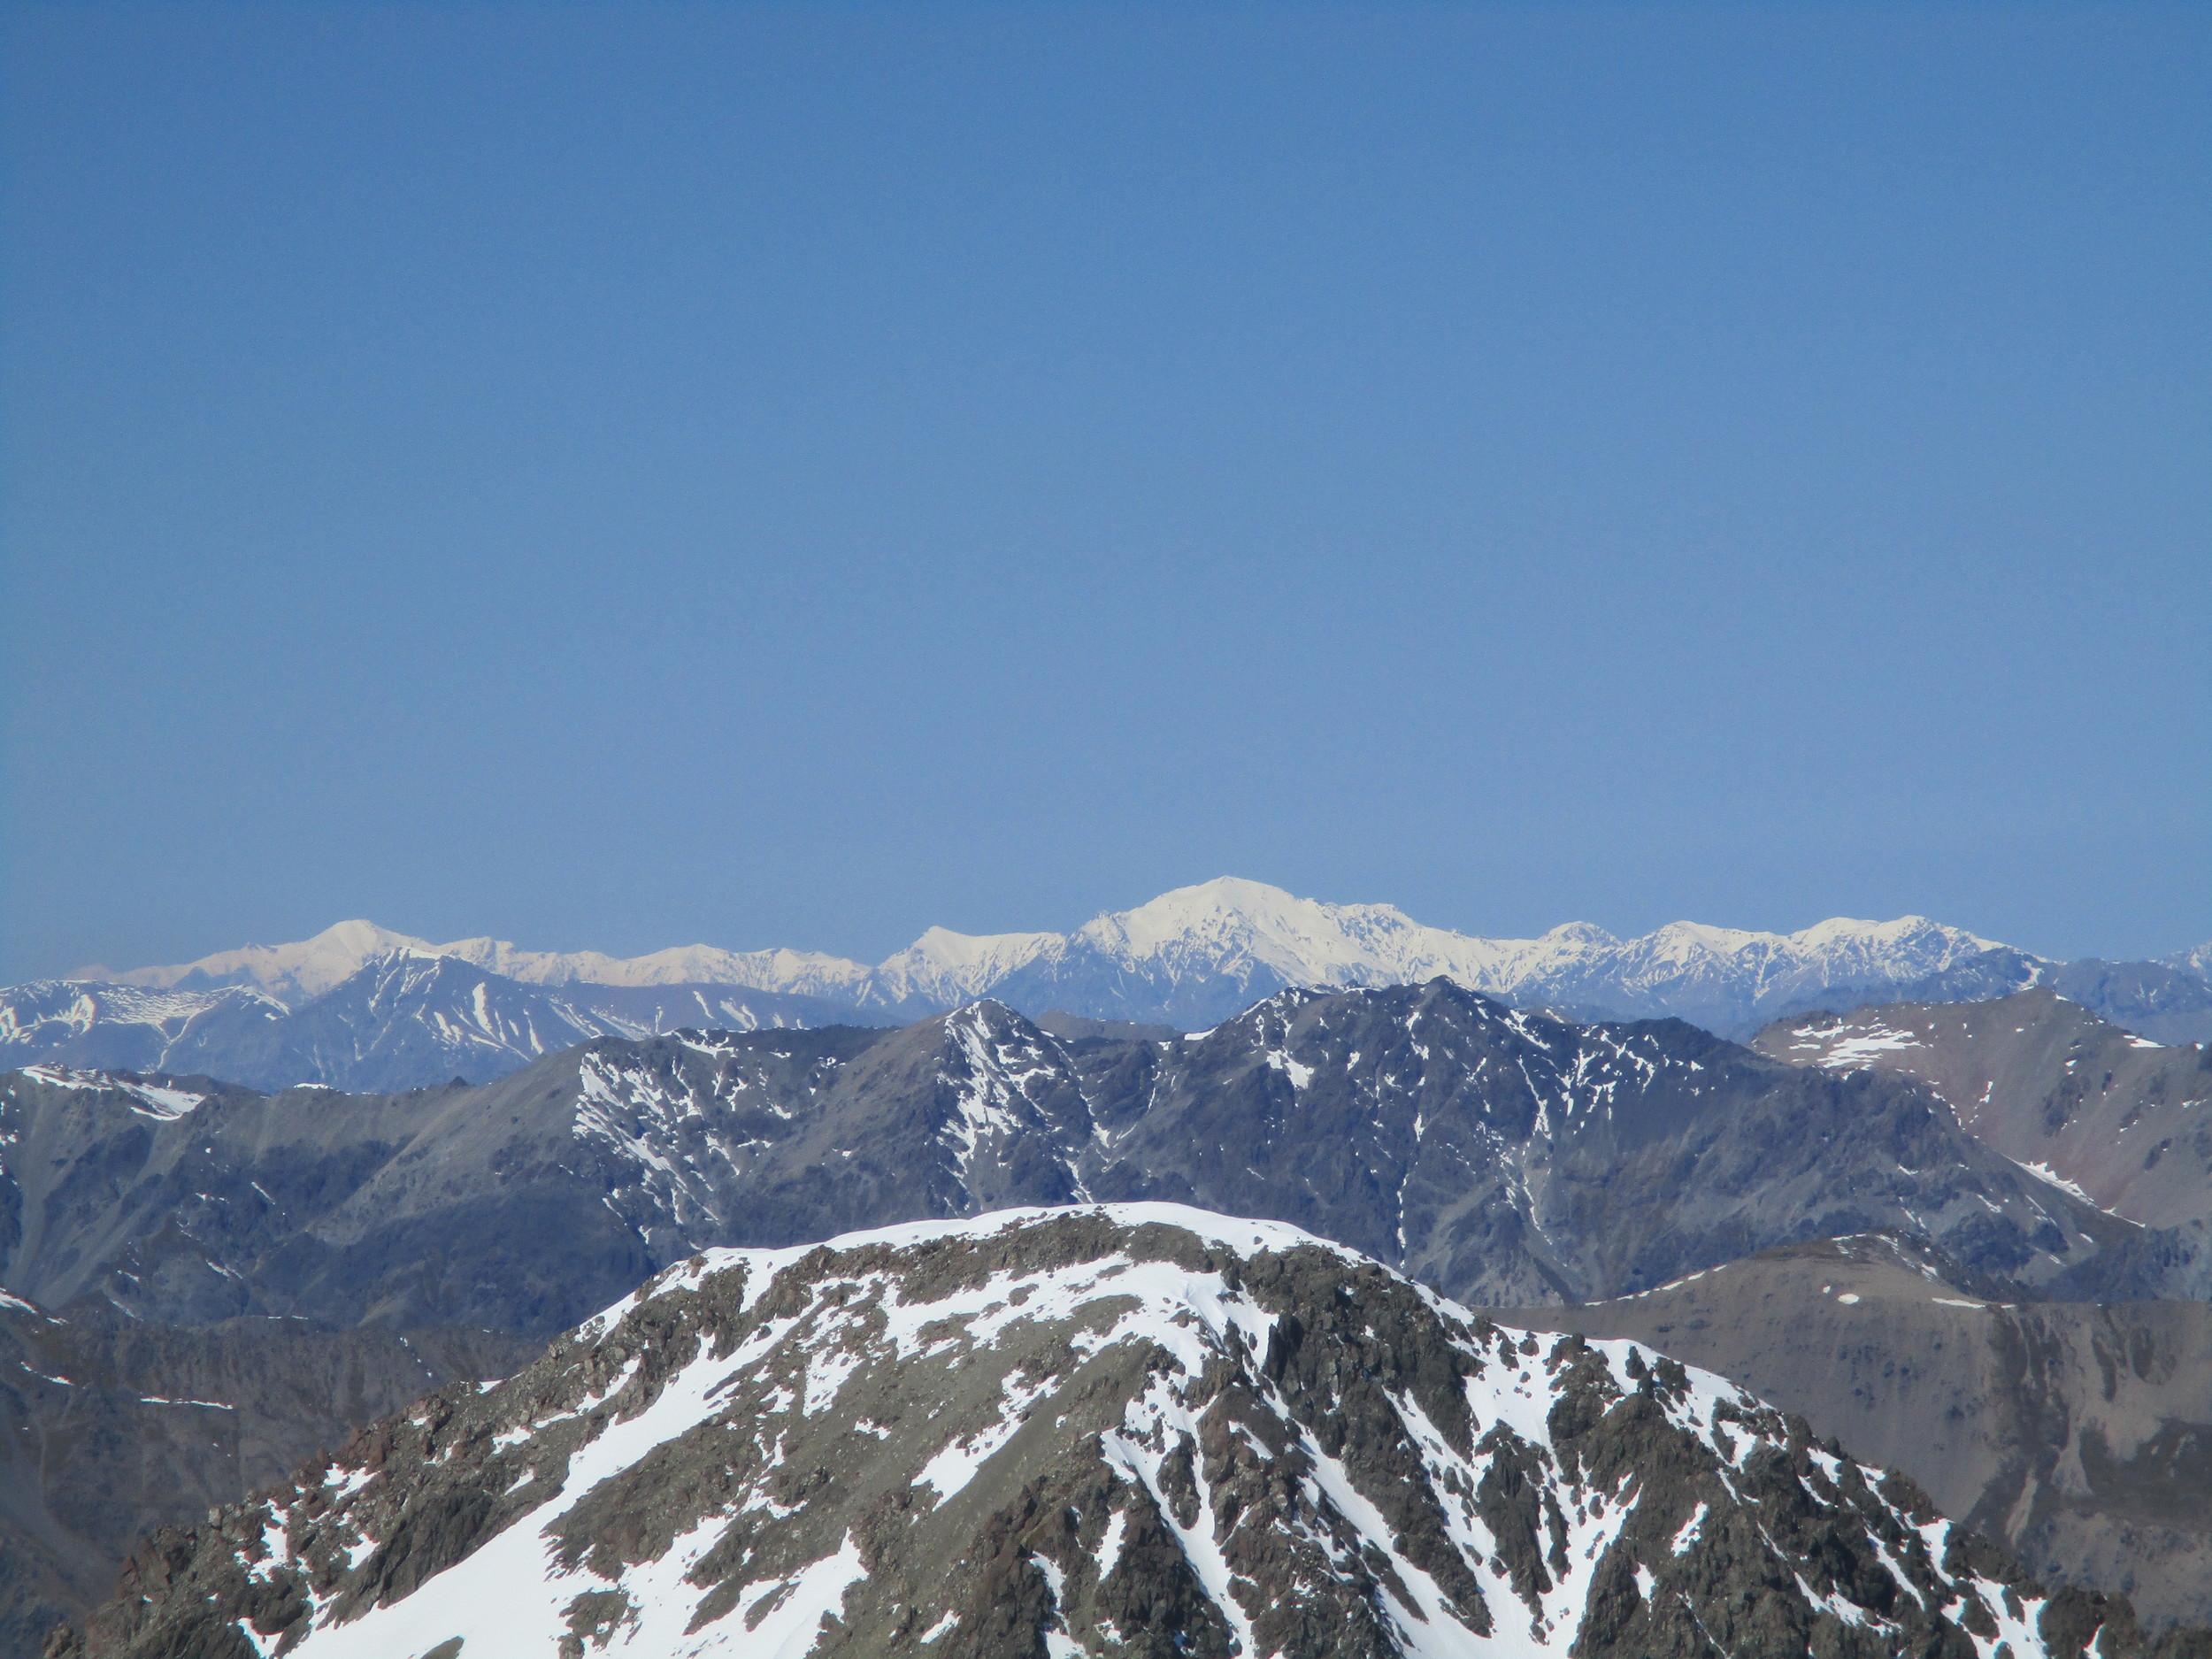 Seaward Kaikoura mountains from Chittenden